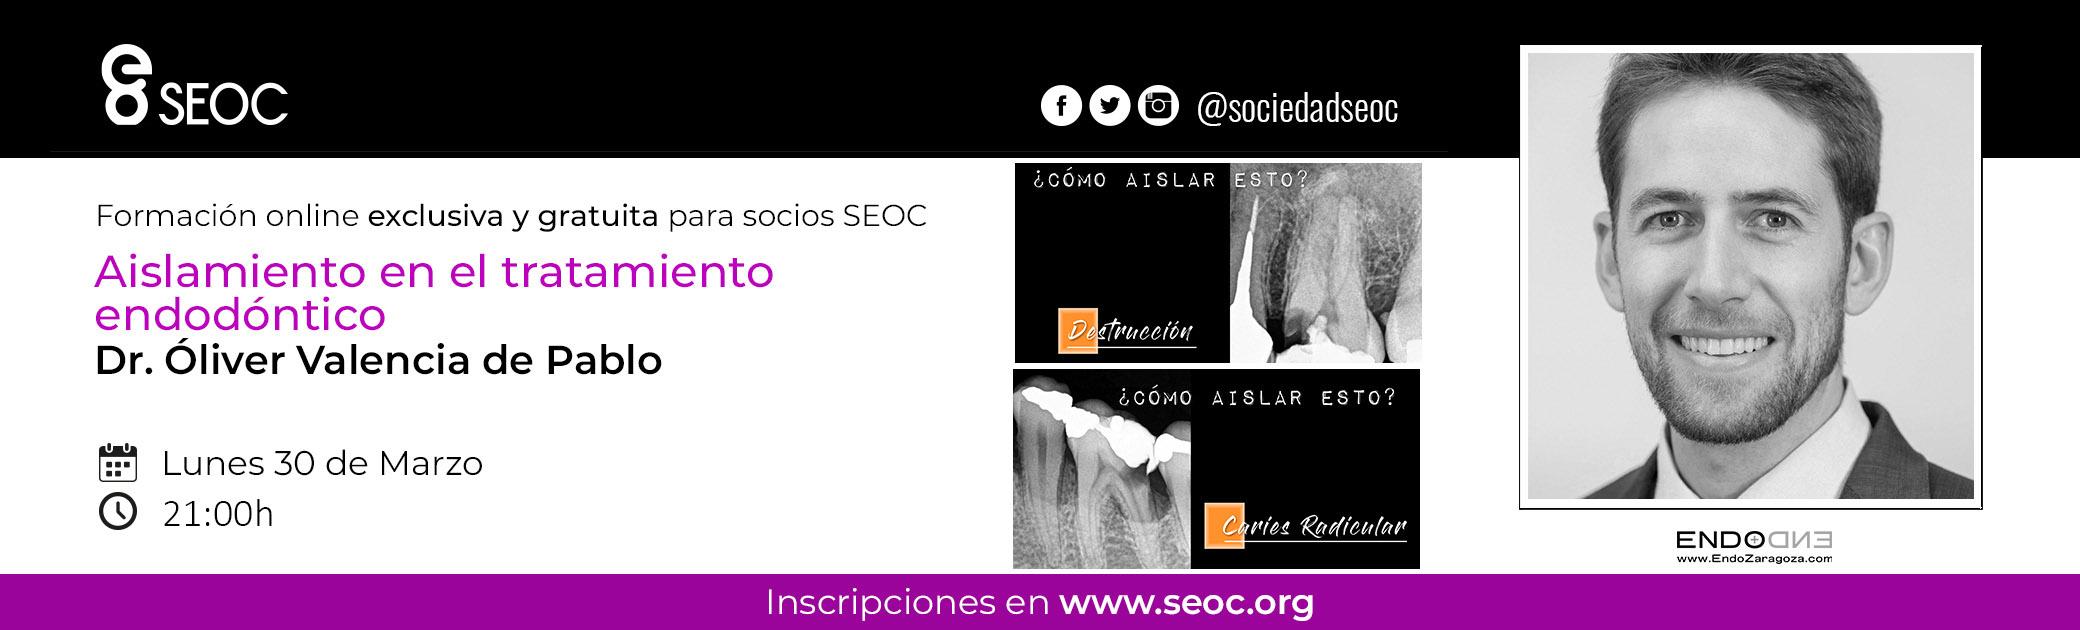 Formacion online SEOC-Oliver Valencia 2020 web